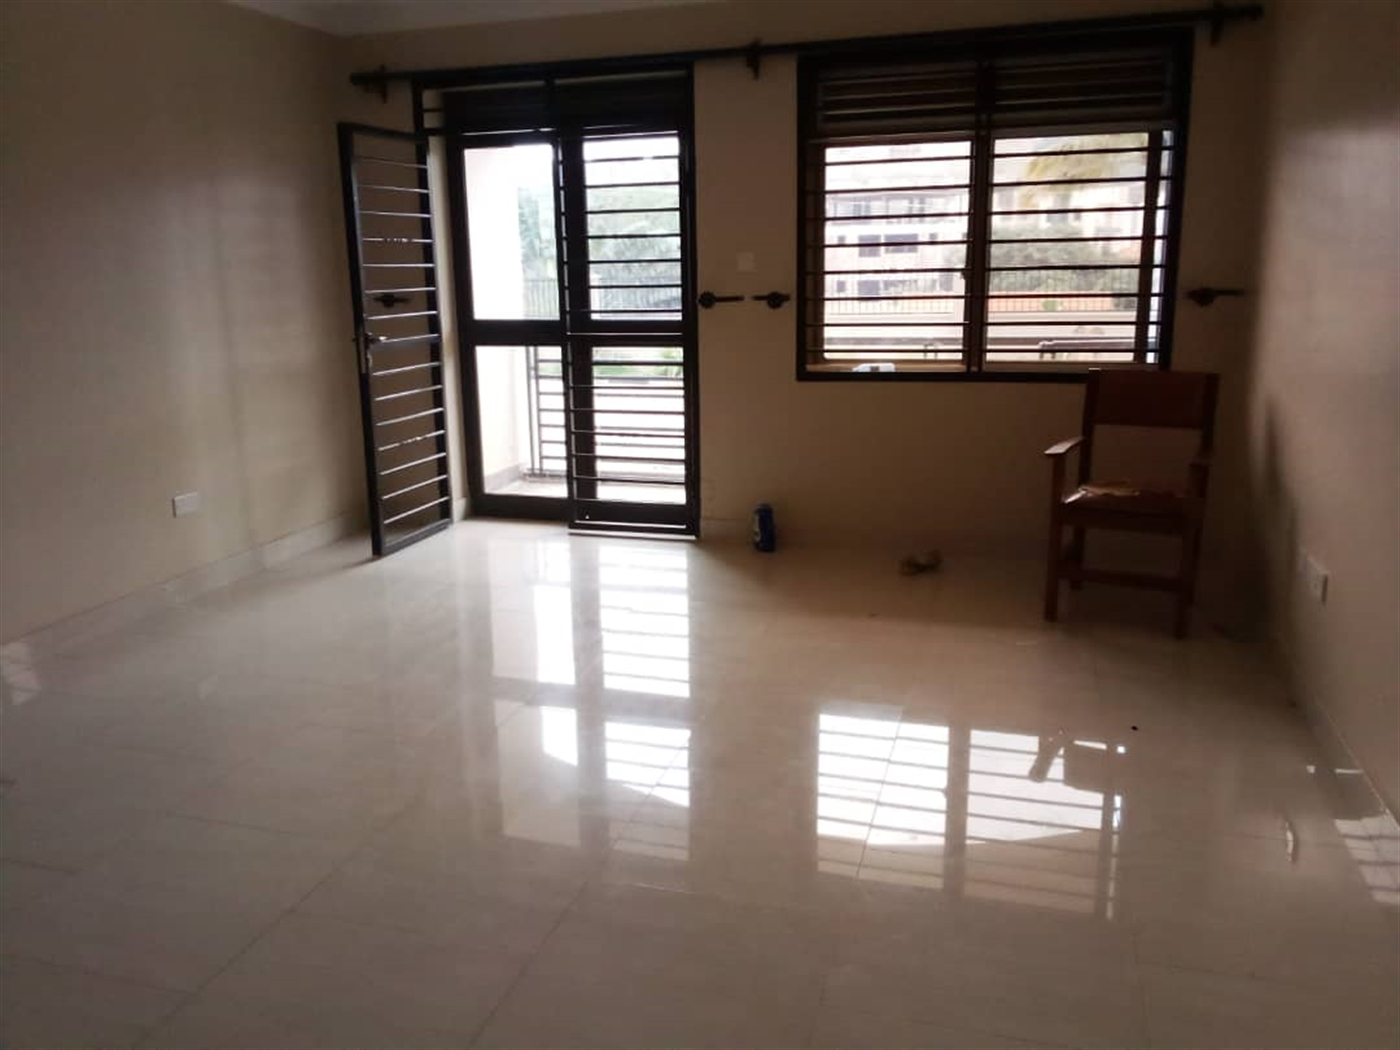 Apartment for rent in Ntinda Wakiso